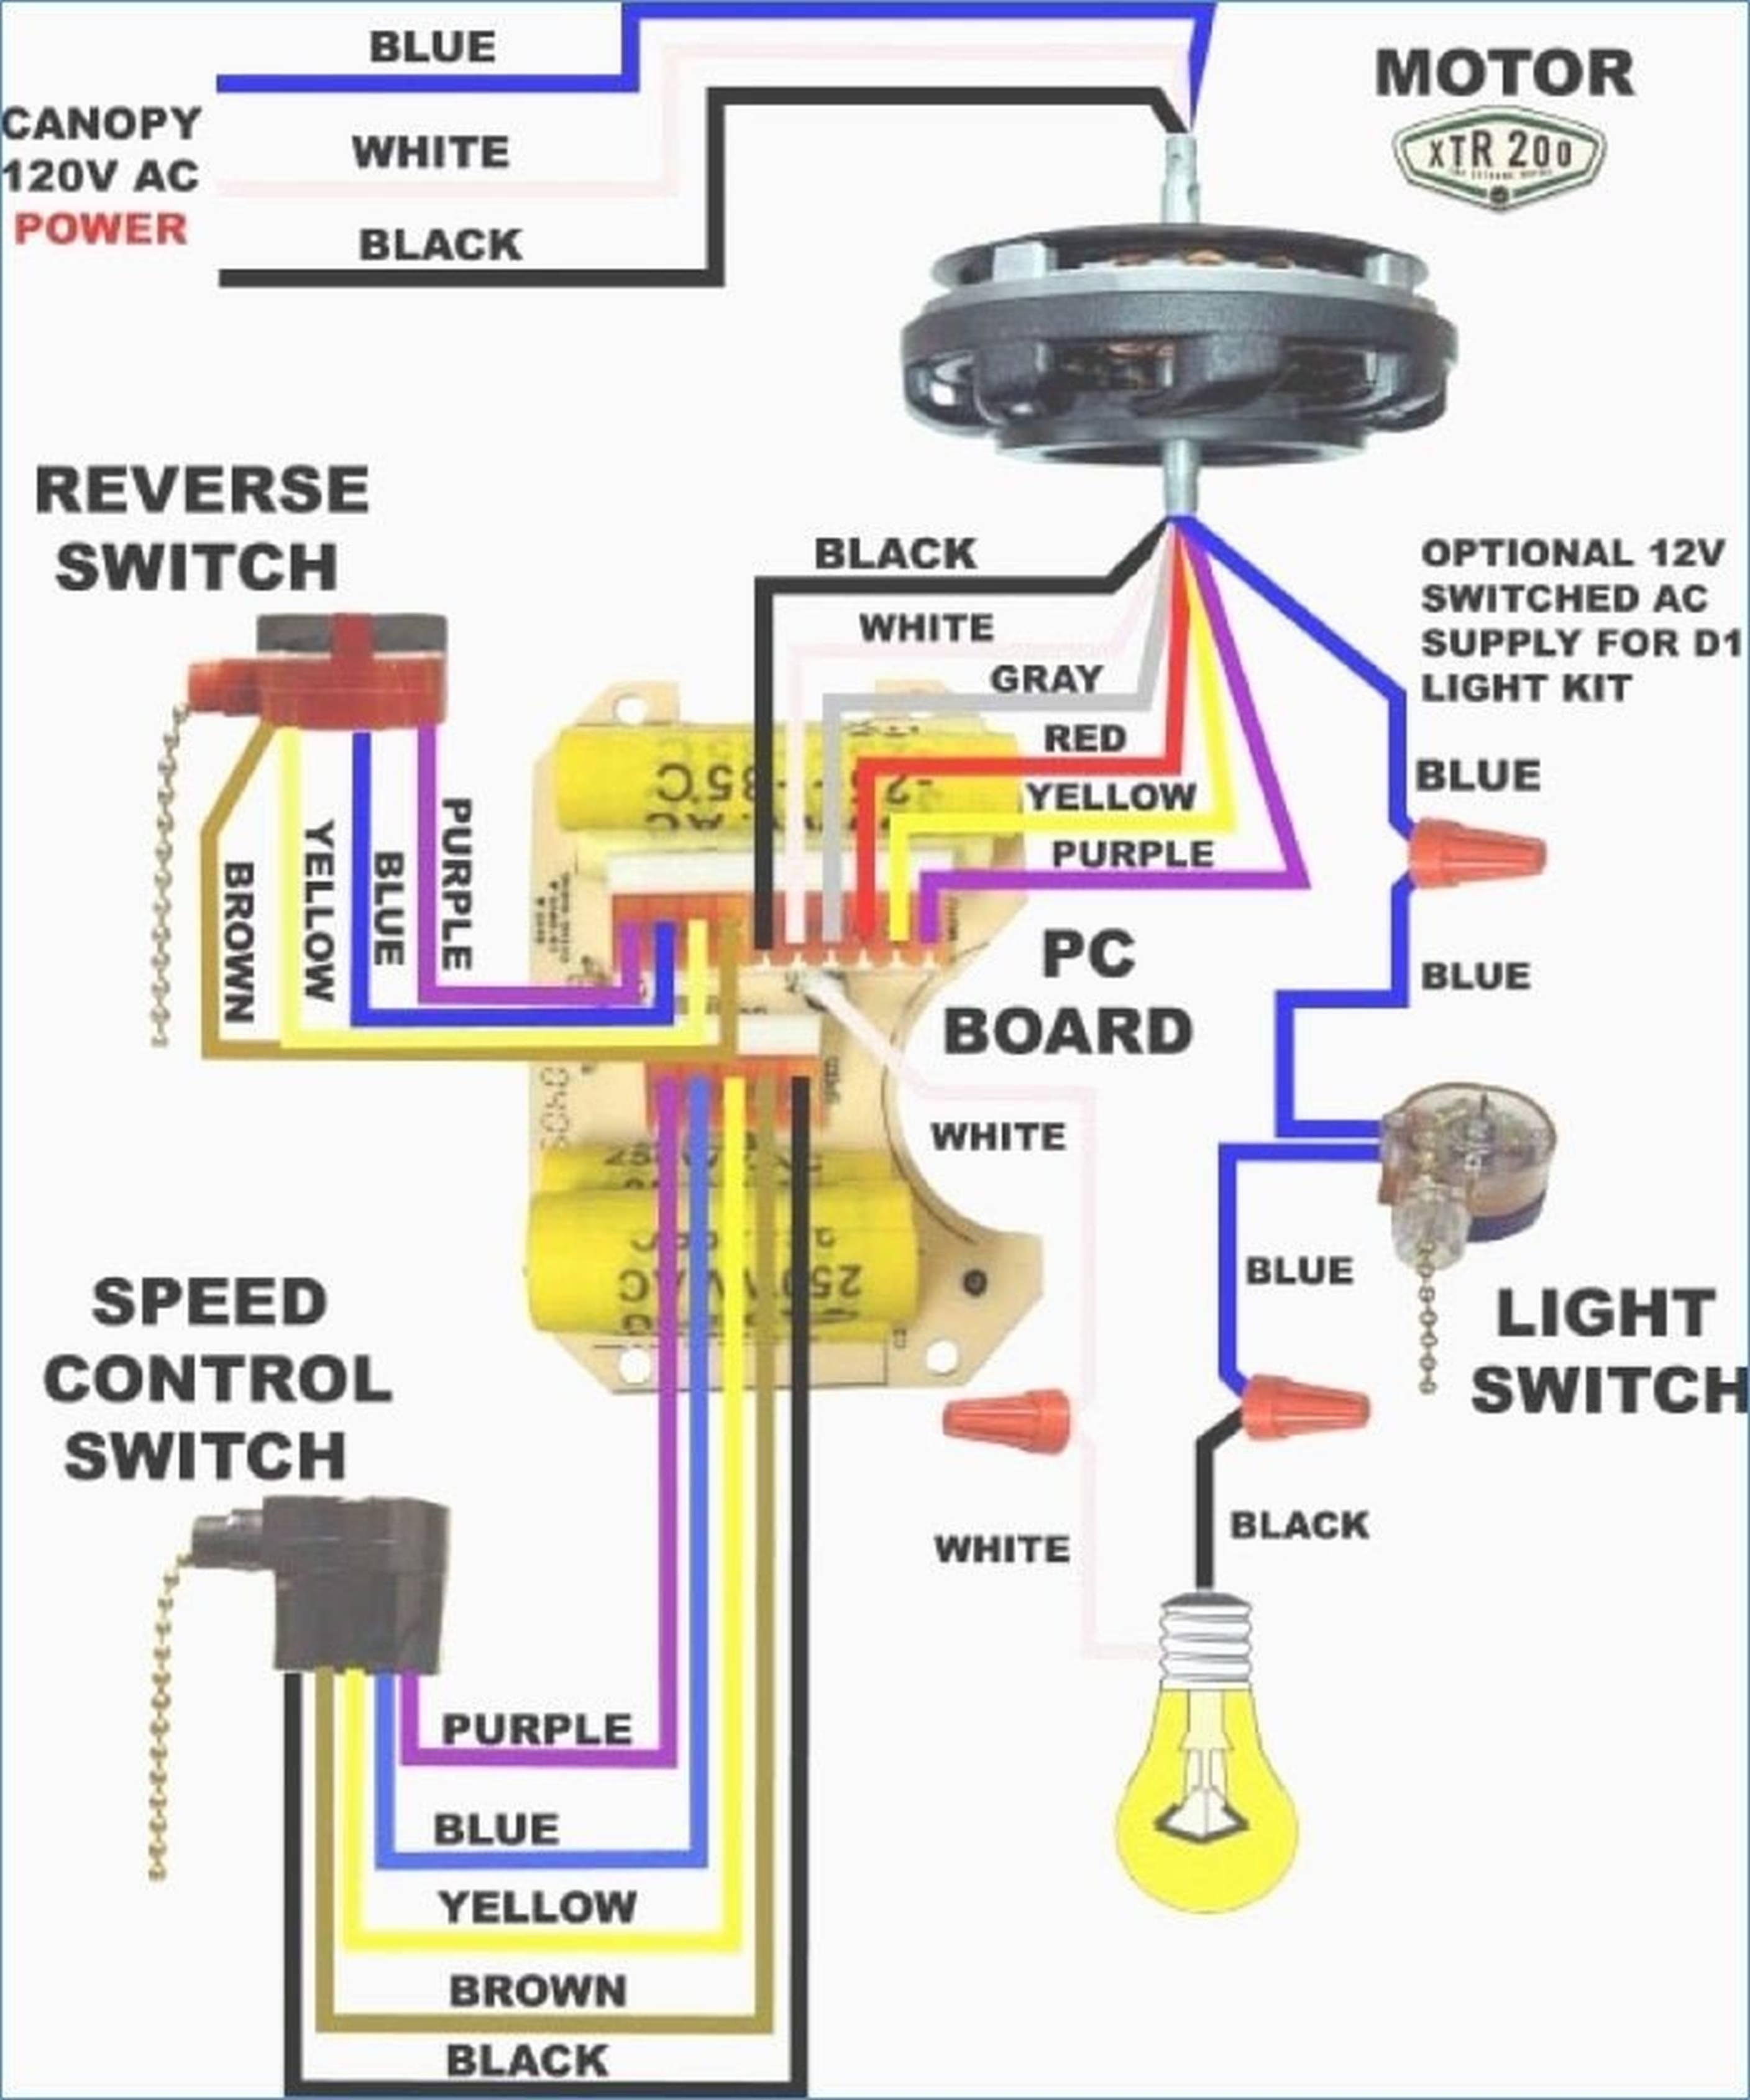 Wiring Diagram For Light Kit To Ceiling Fan - Wiring Diagram Data - Wiring Diagram For Ceiling Fan